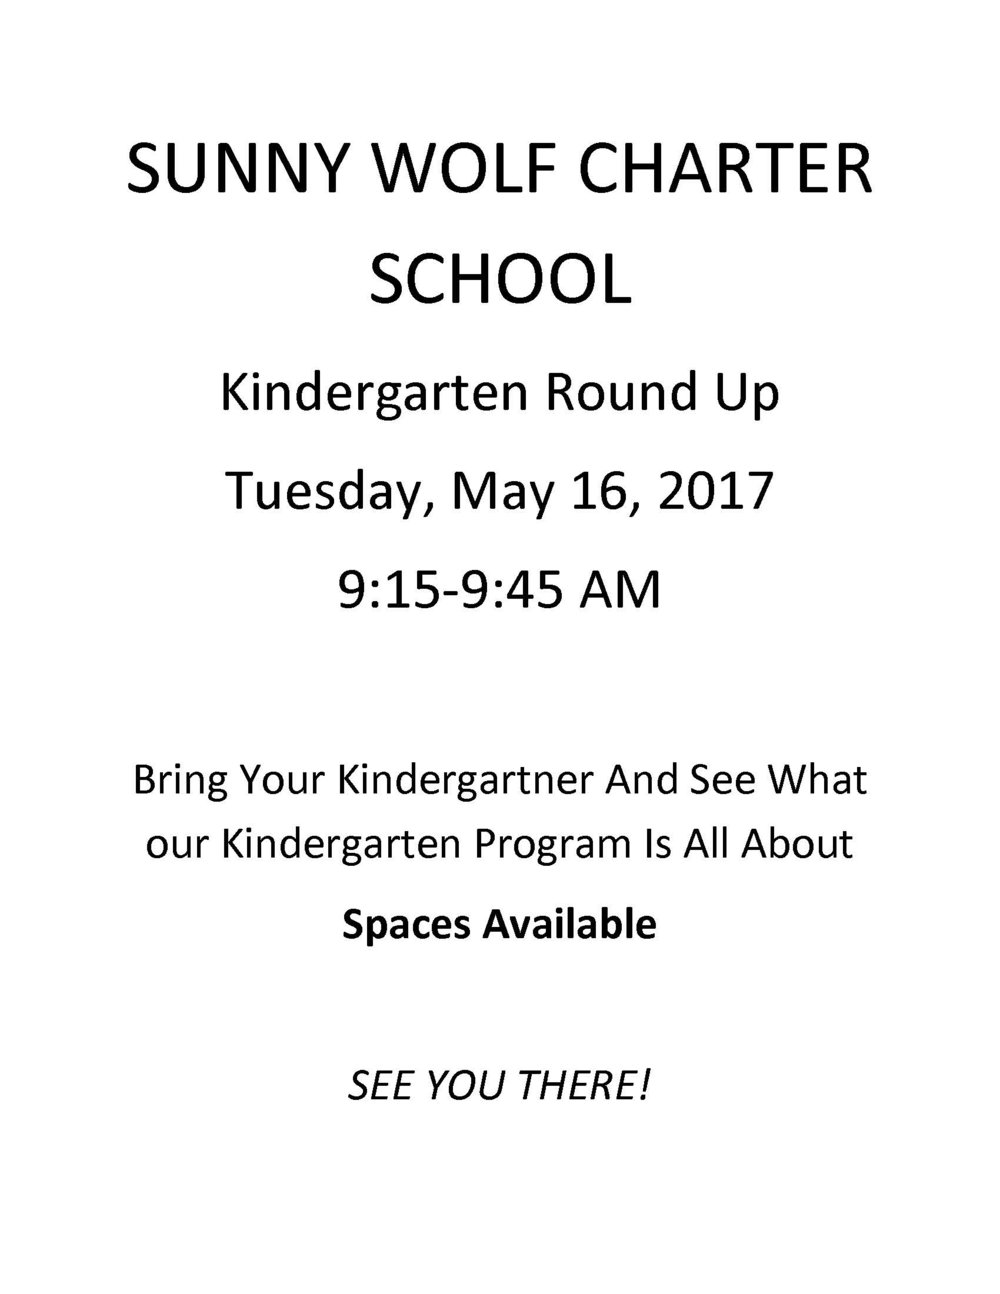 SUNNY WOLF CHARTER SCHOOLKindergarten Roundup 2017[21639].jpg